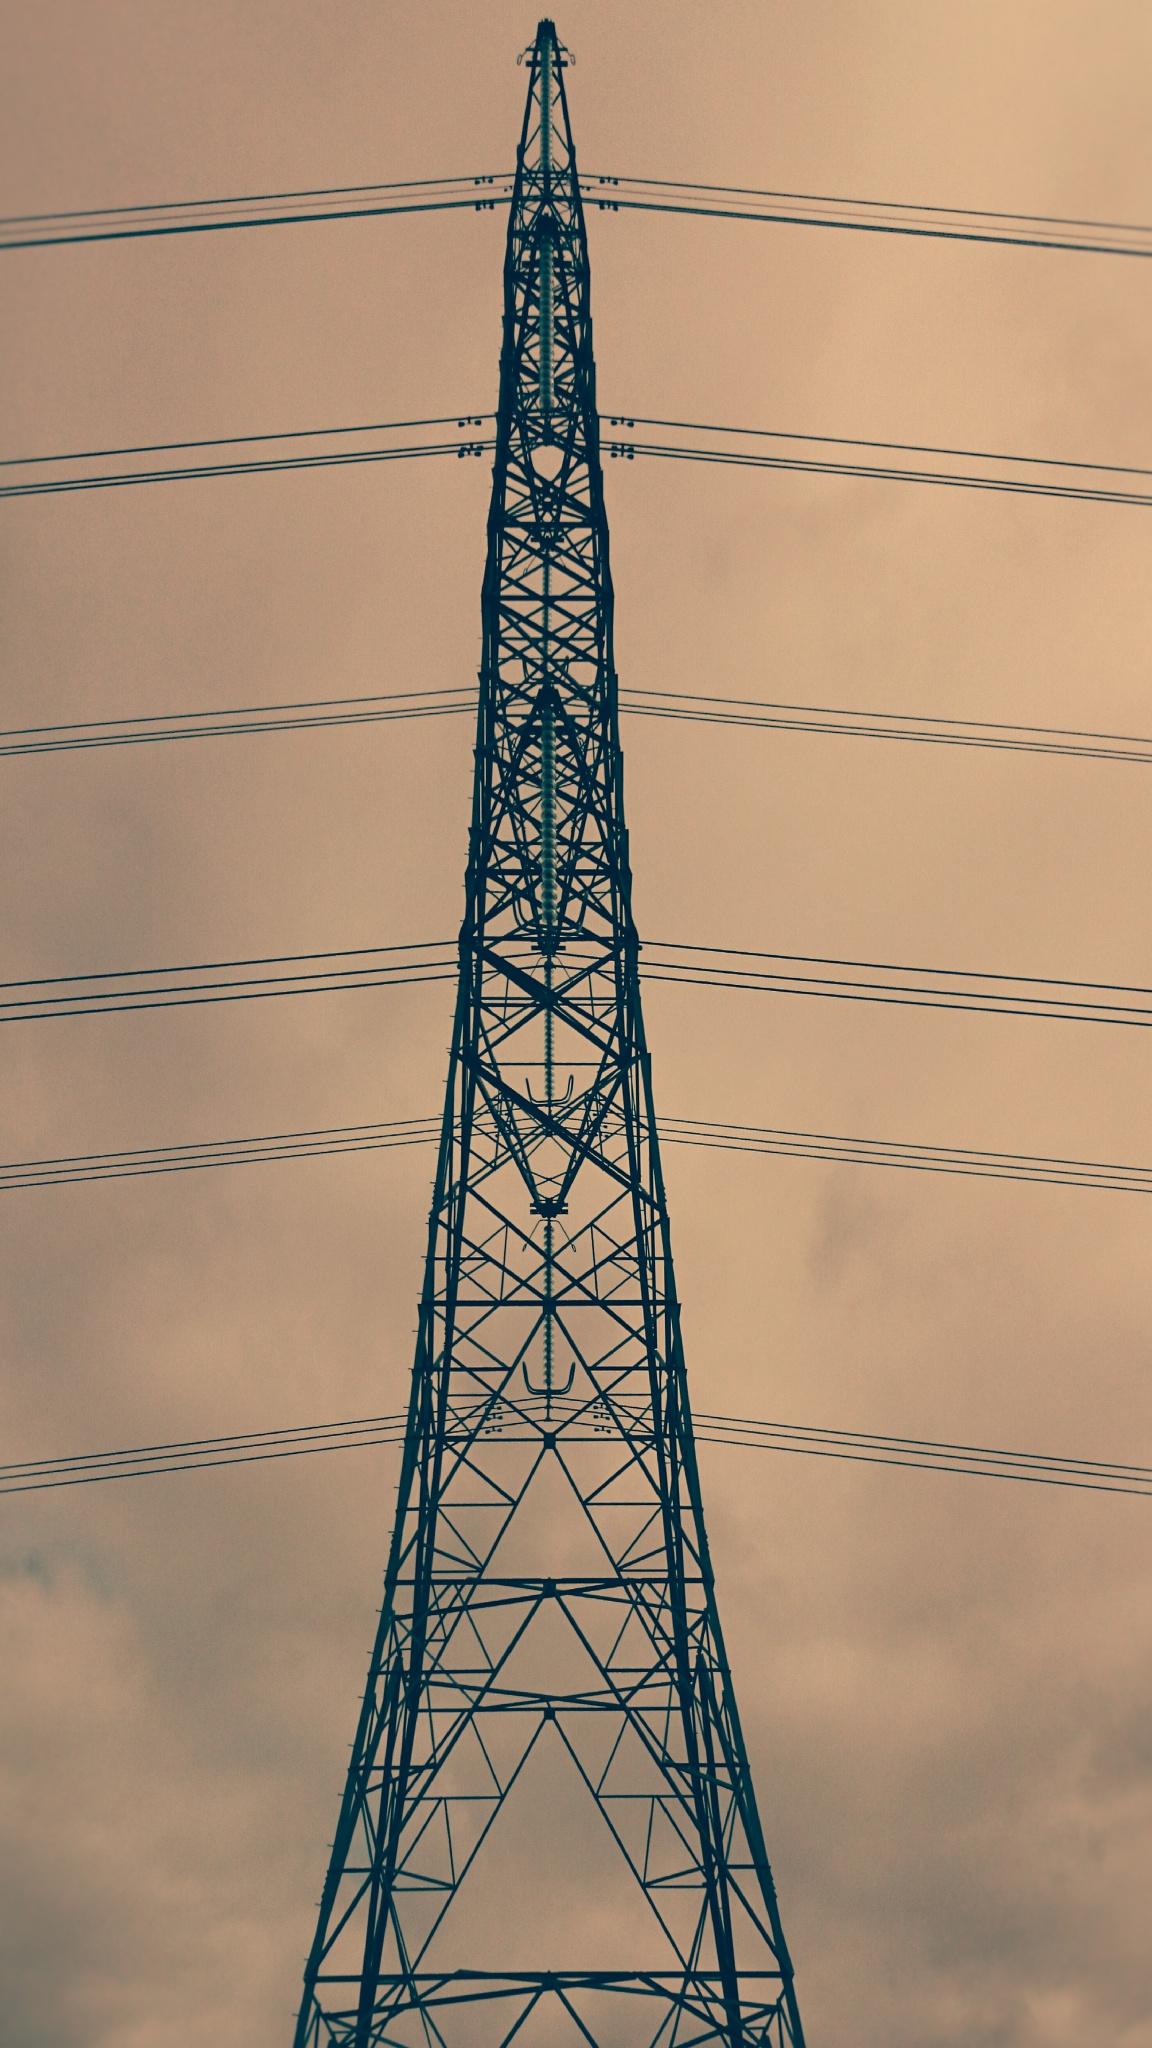 Pylon 2 by geoff richards